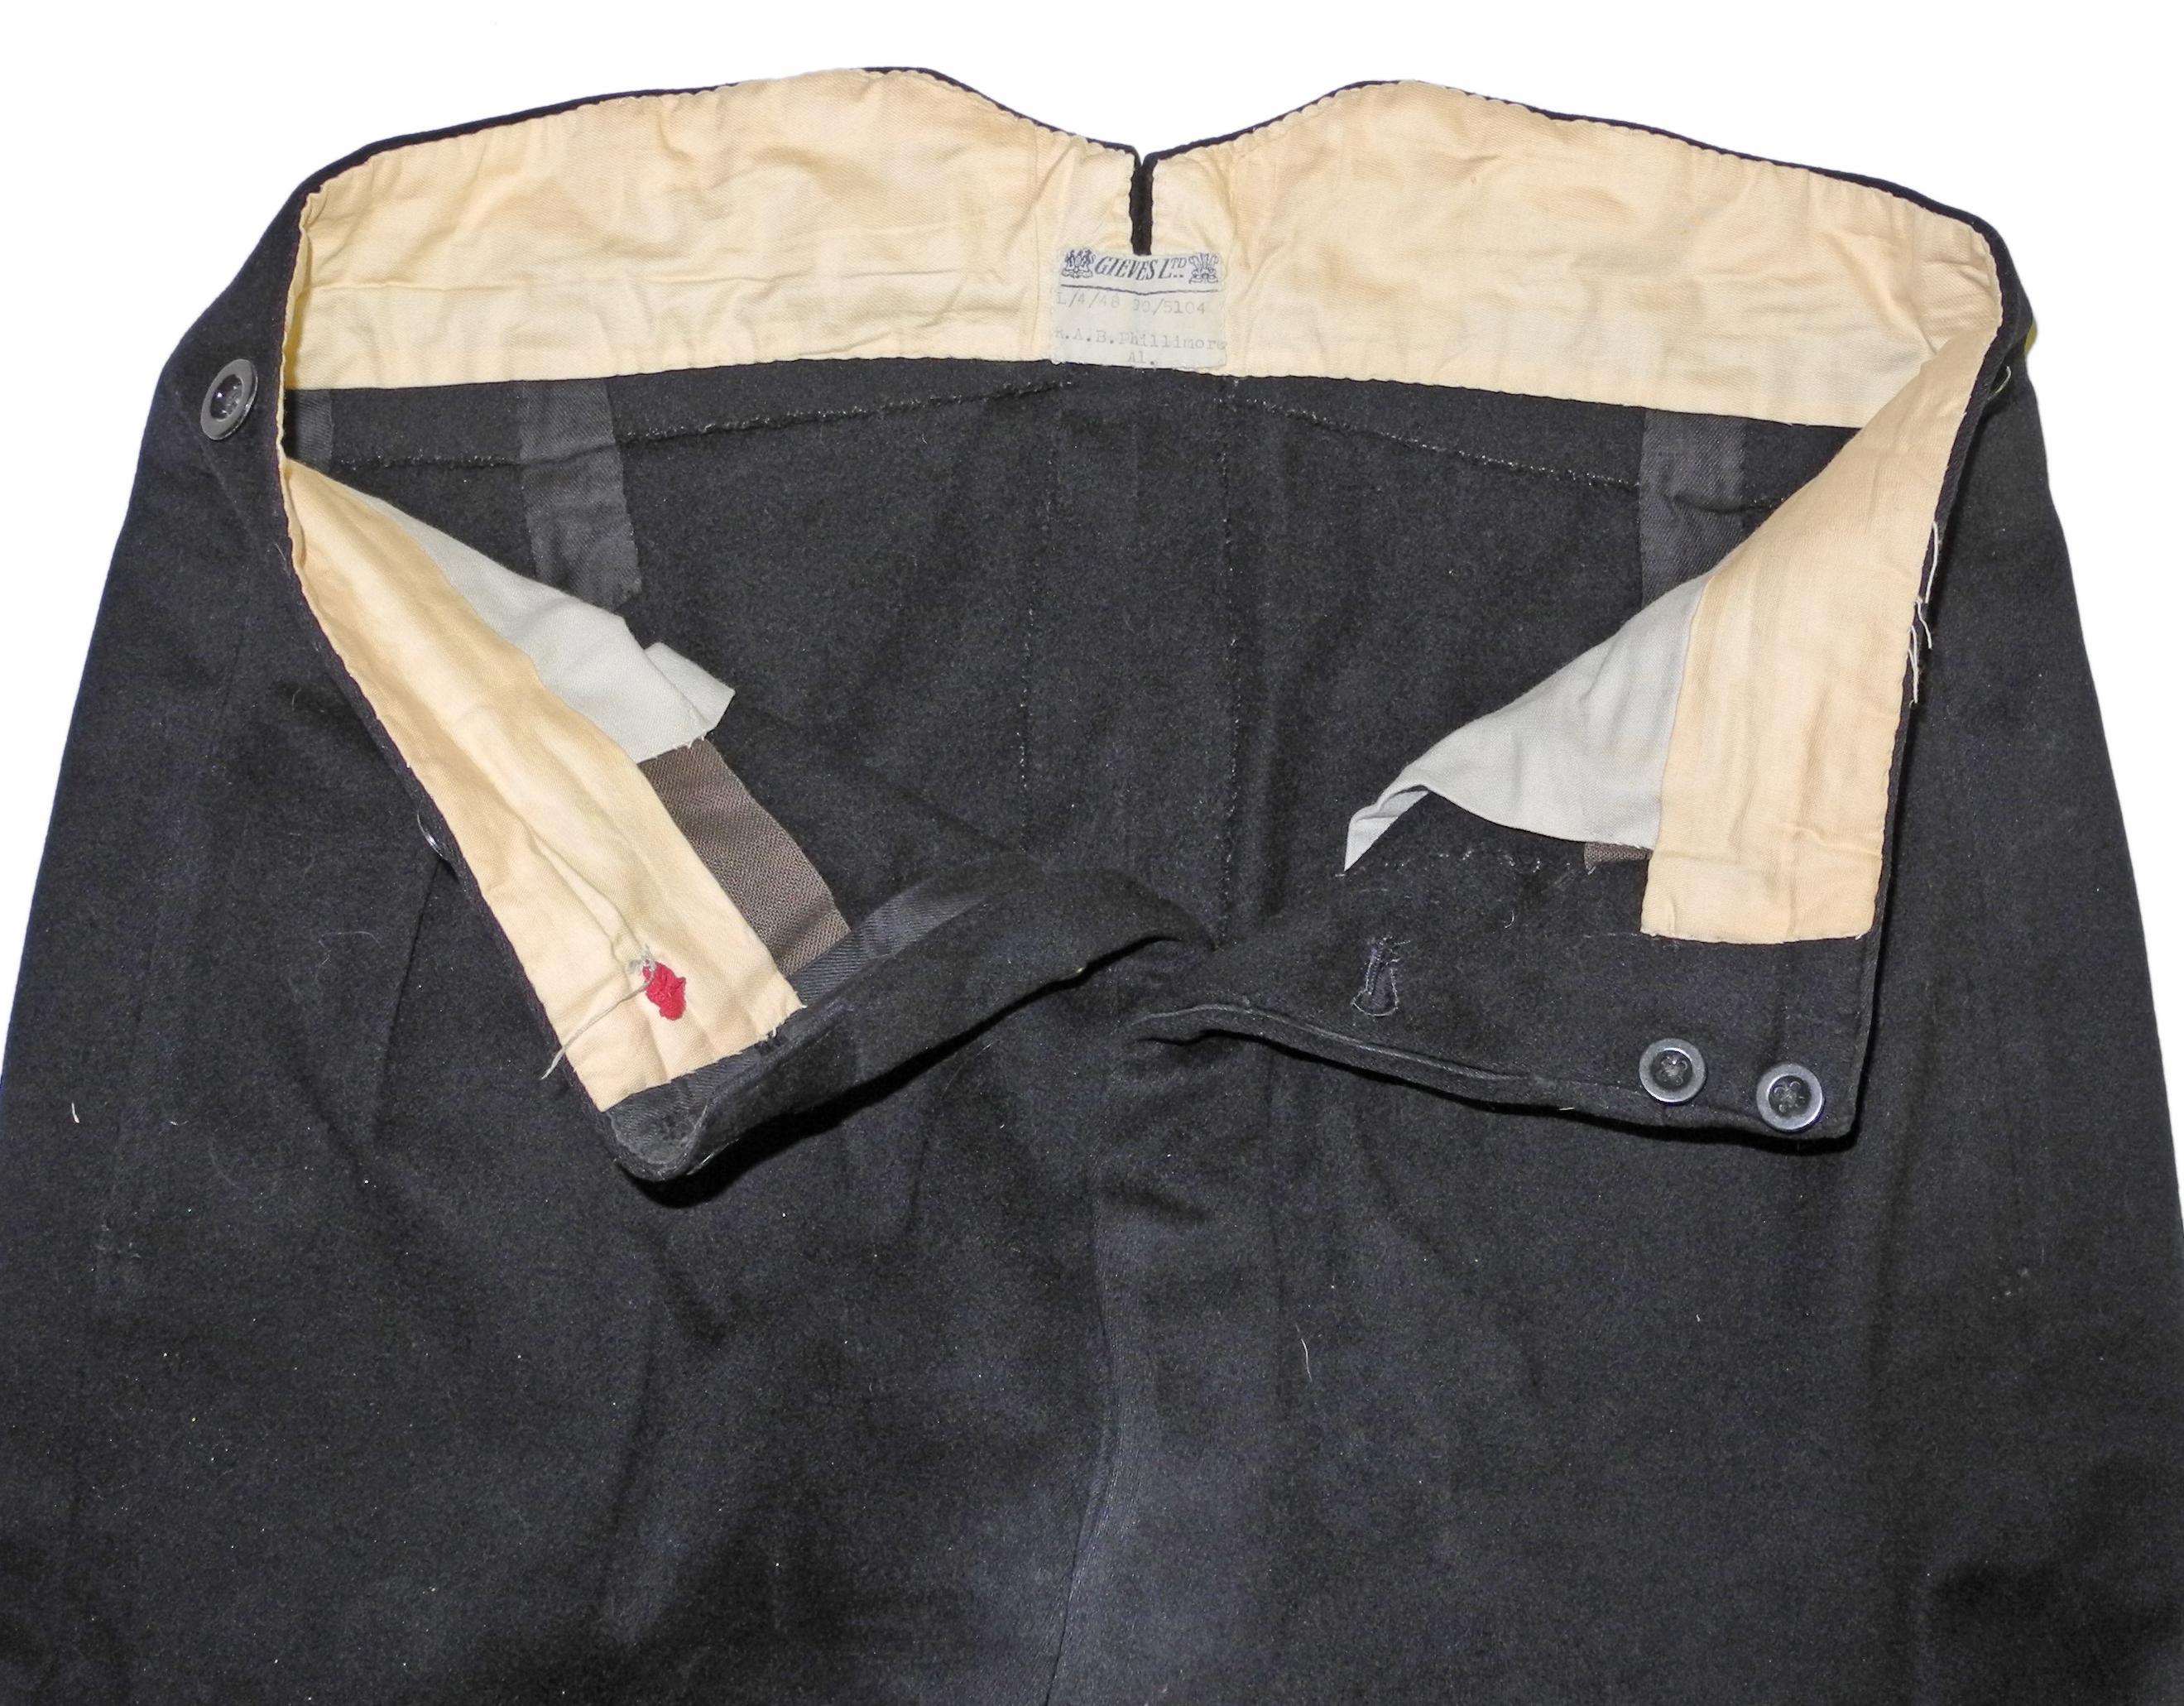 WWII RN FAA uniform to a Cmdr.